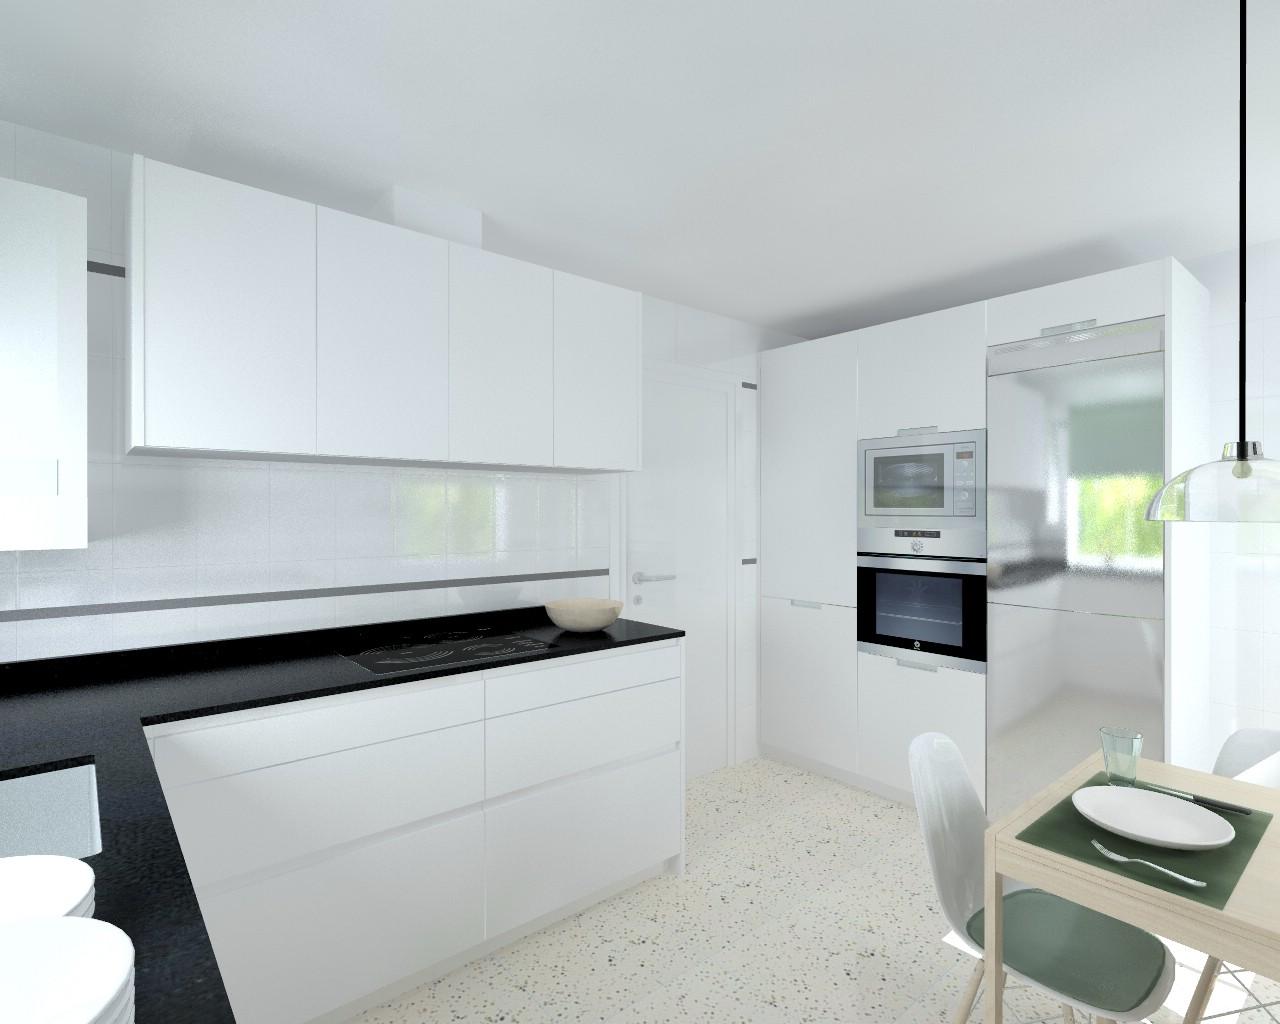 Madrid cocina santos modelo line l blanco seda mate - Docrys cocinas ...